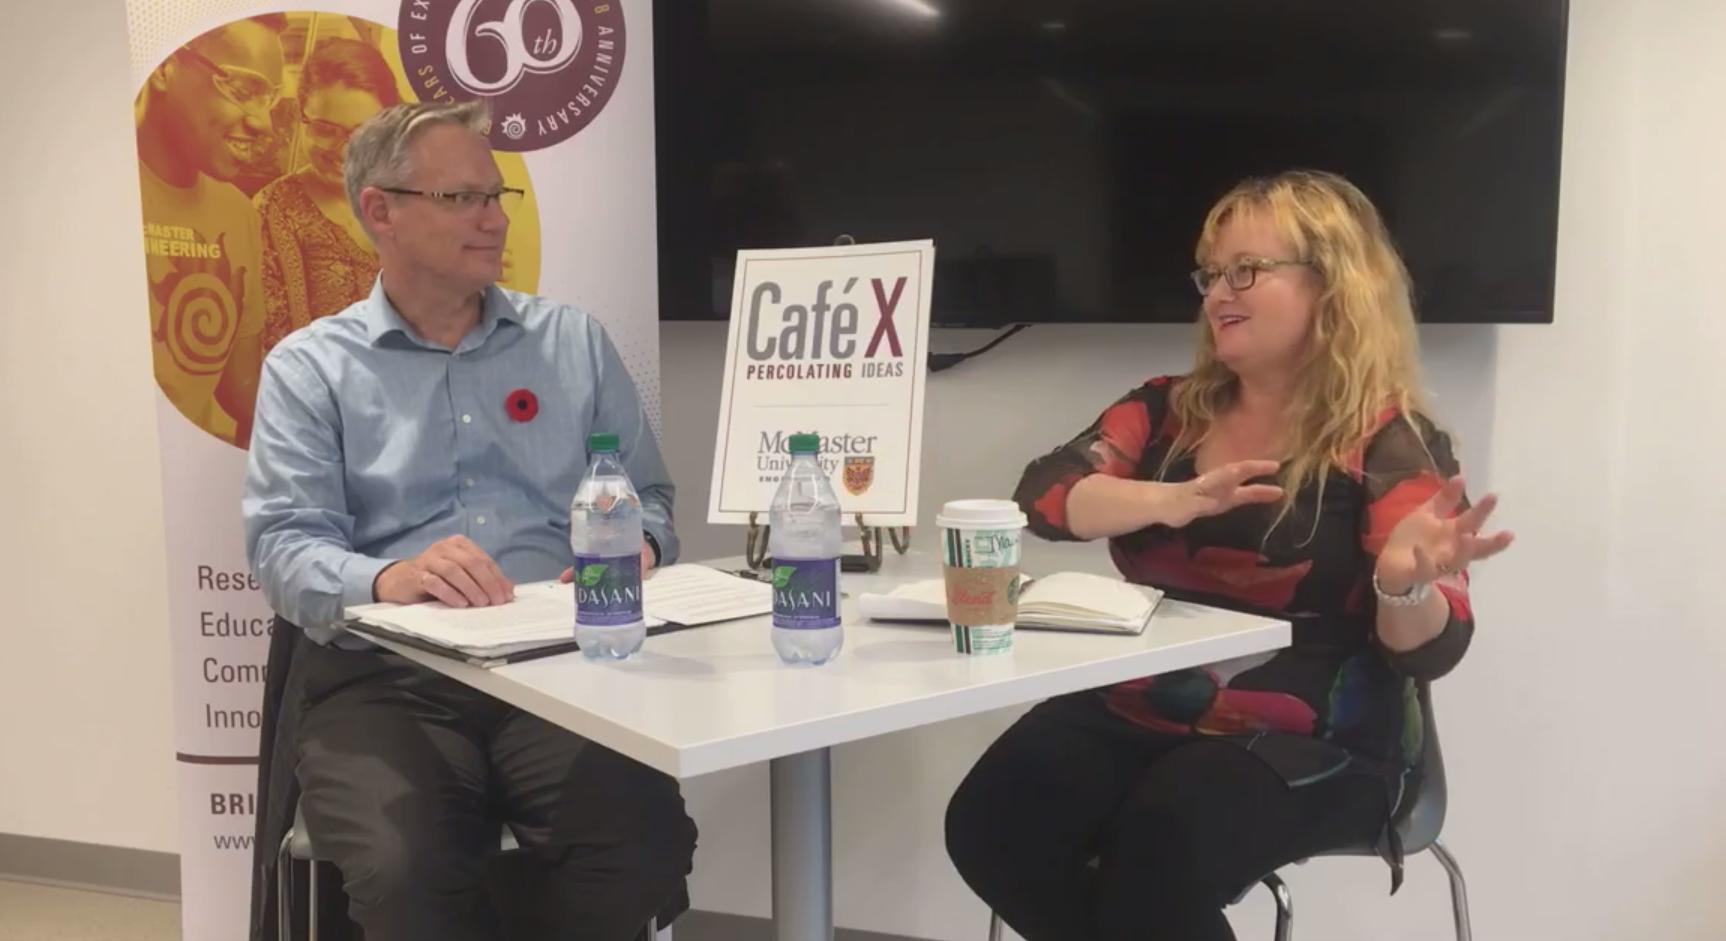 Café X:  Percolating Big Ideas with Irene Sterian